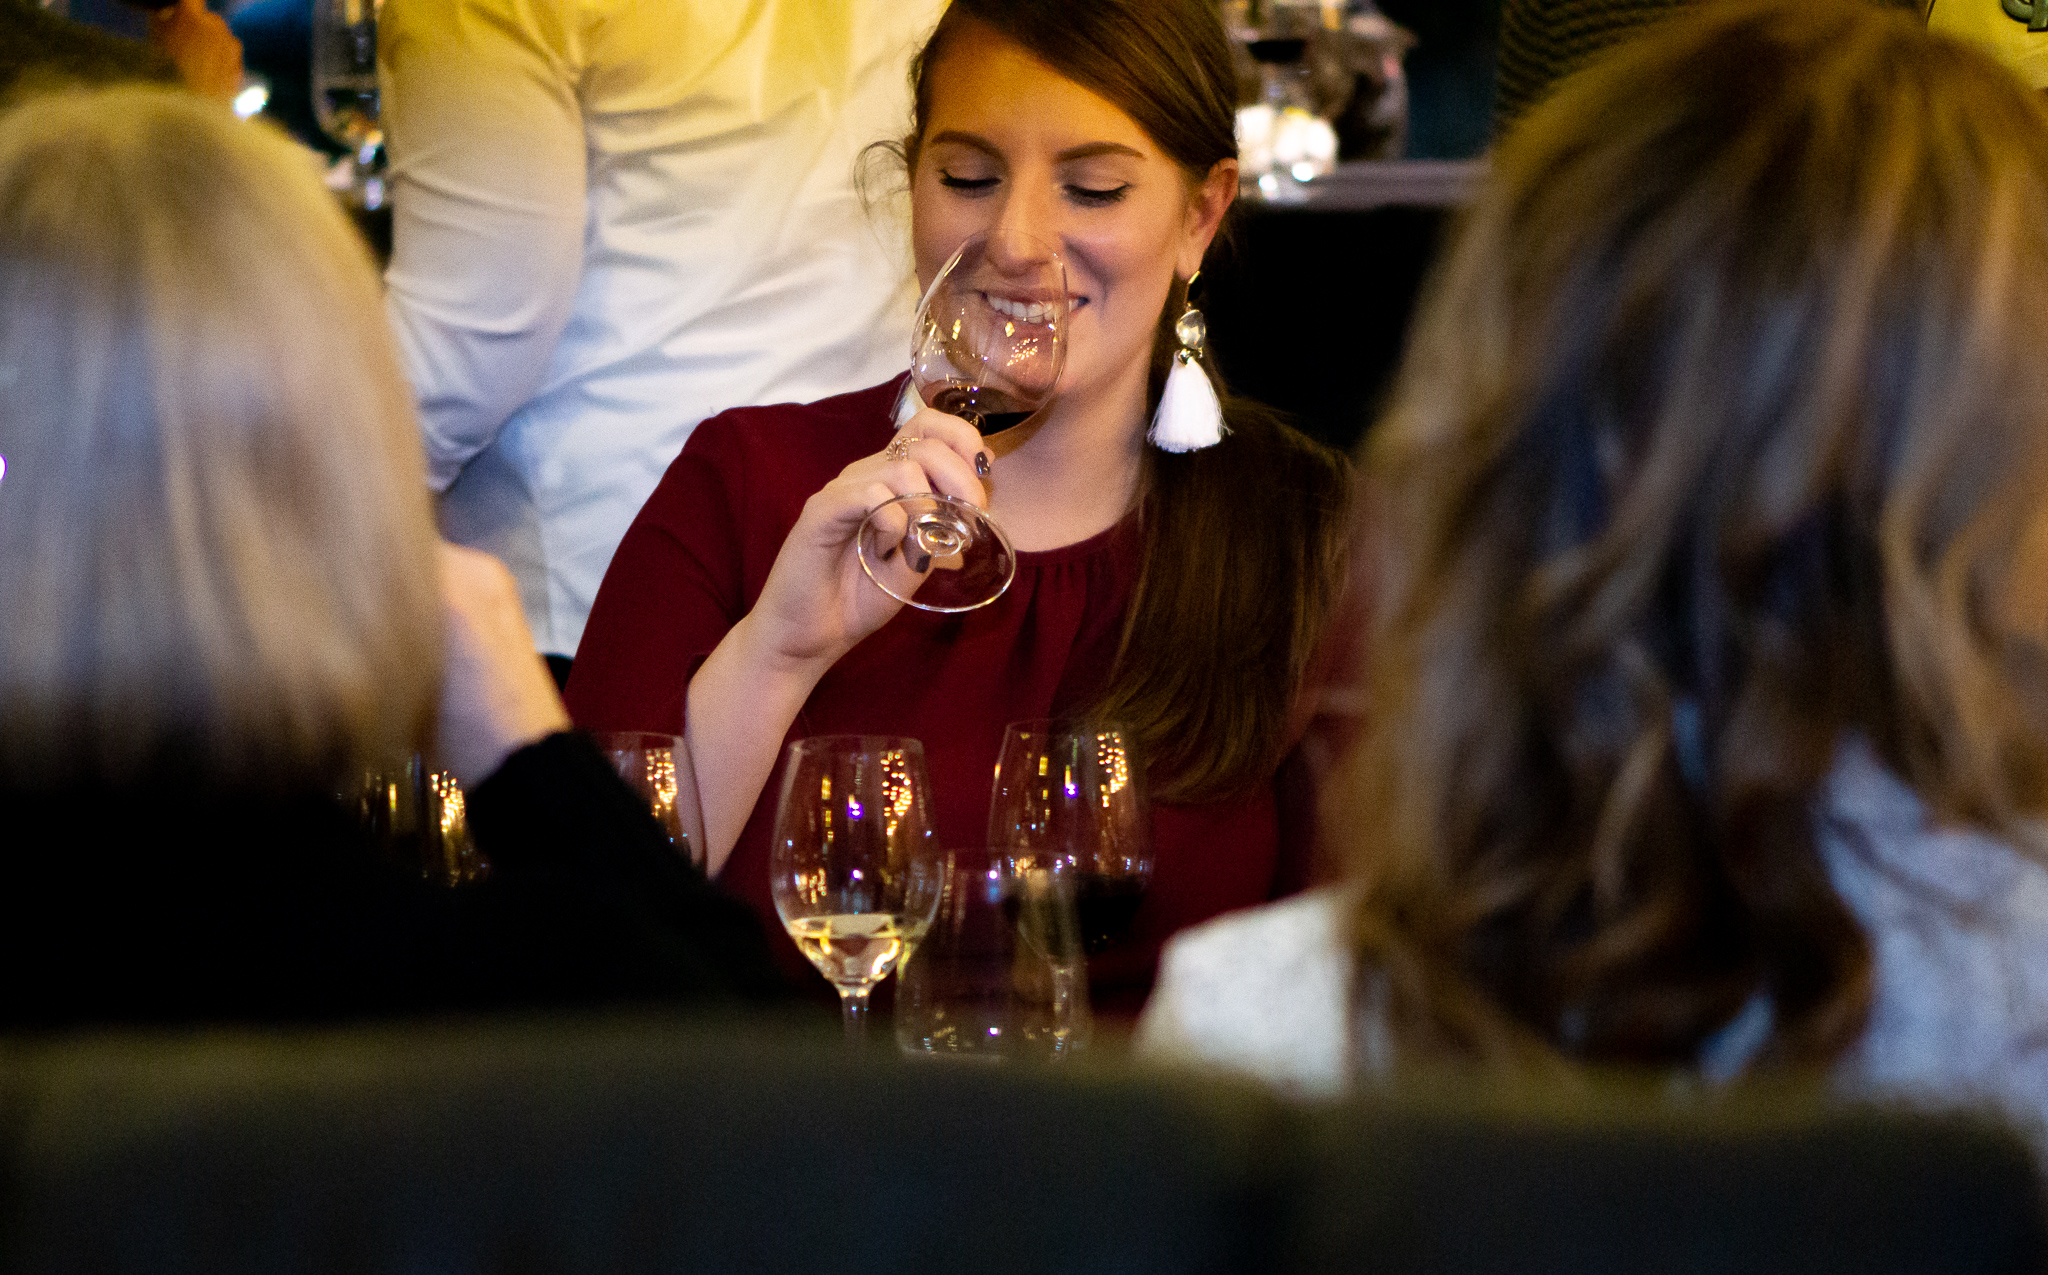 wine-maestro-the-sassy-gourmet-wine85.jpg